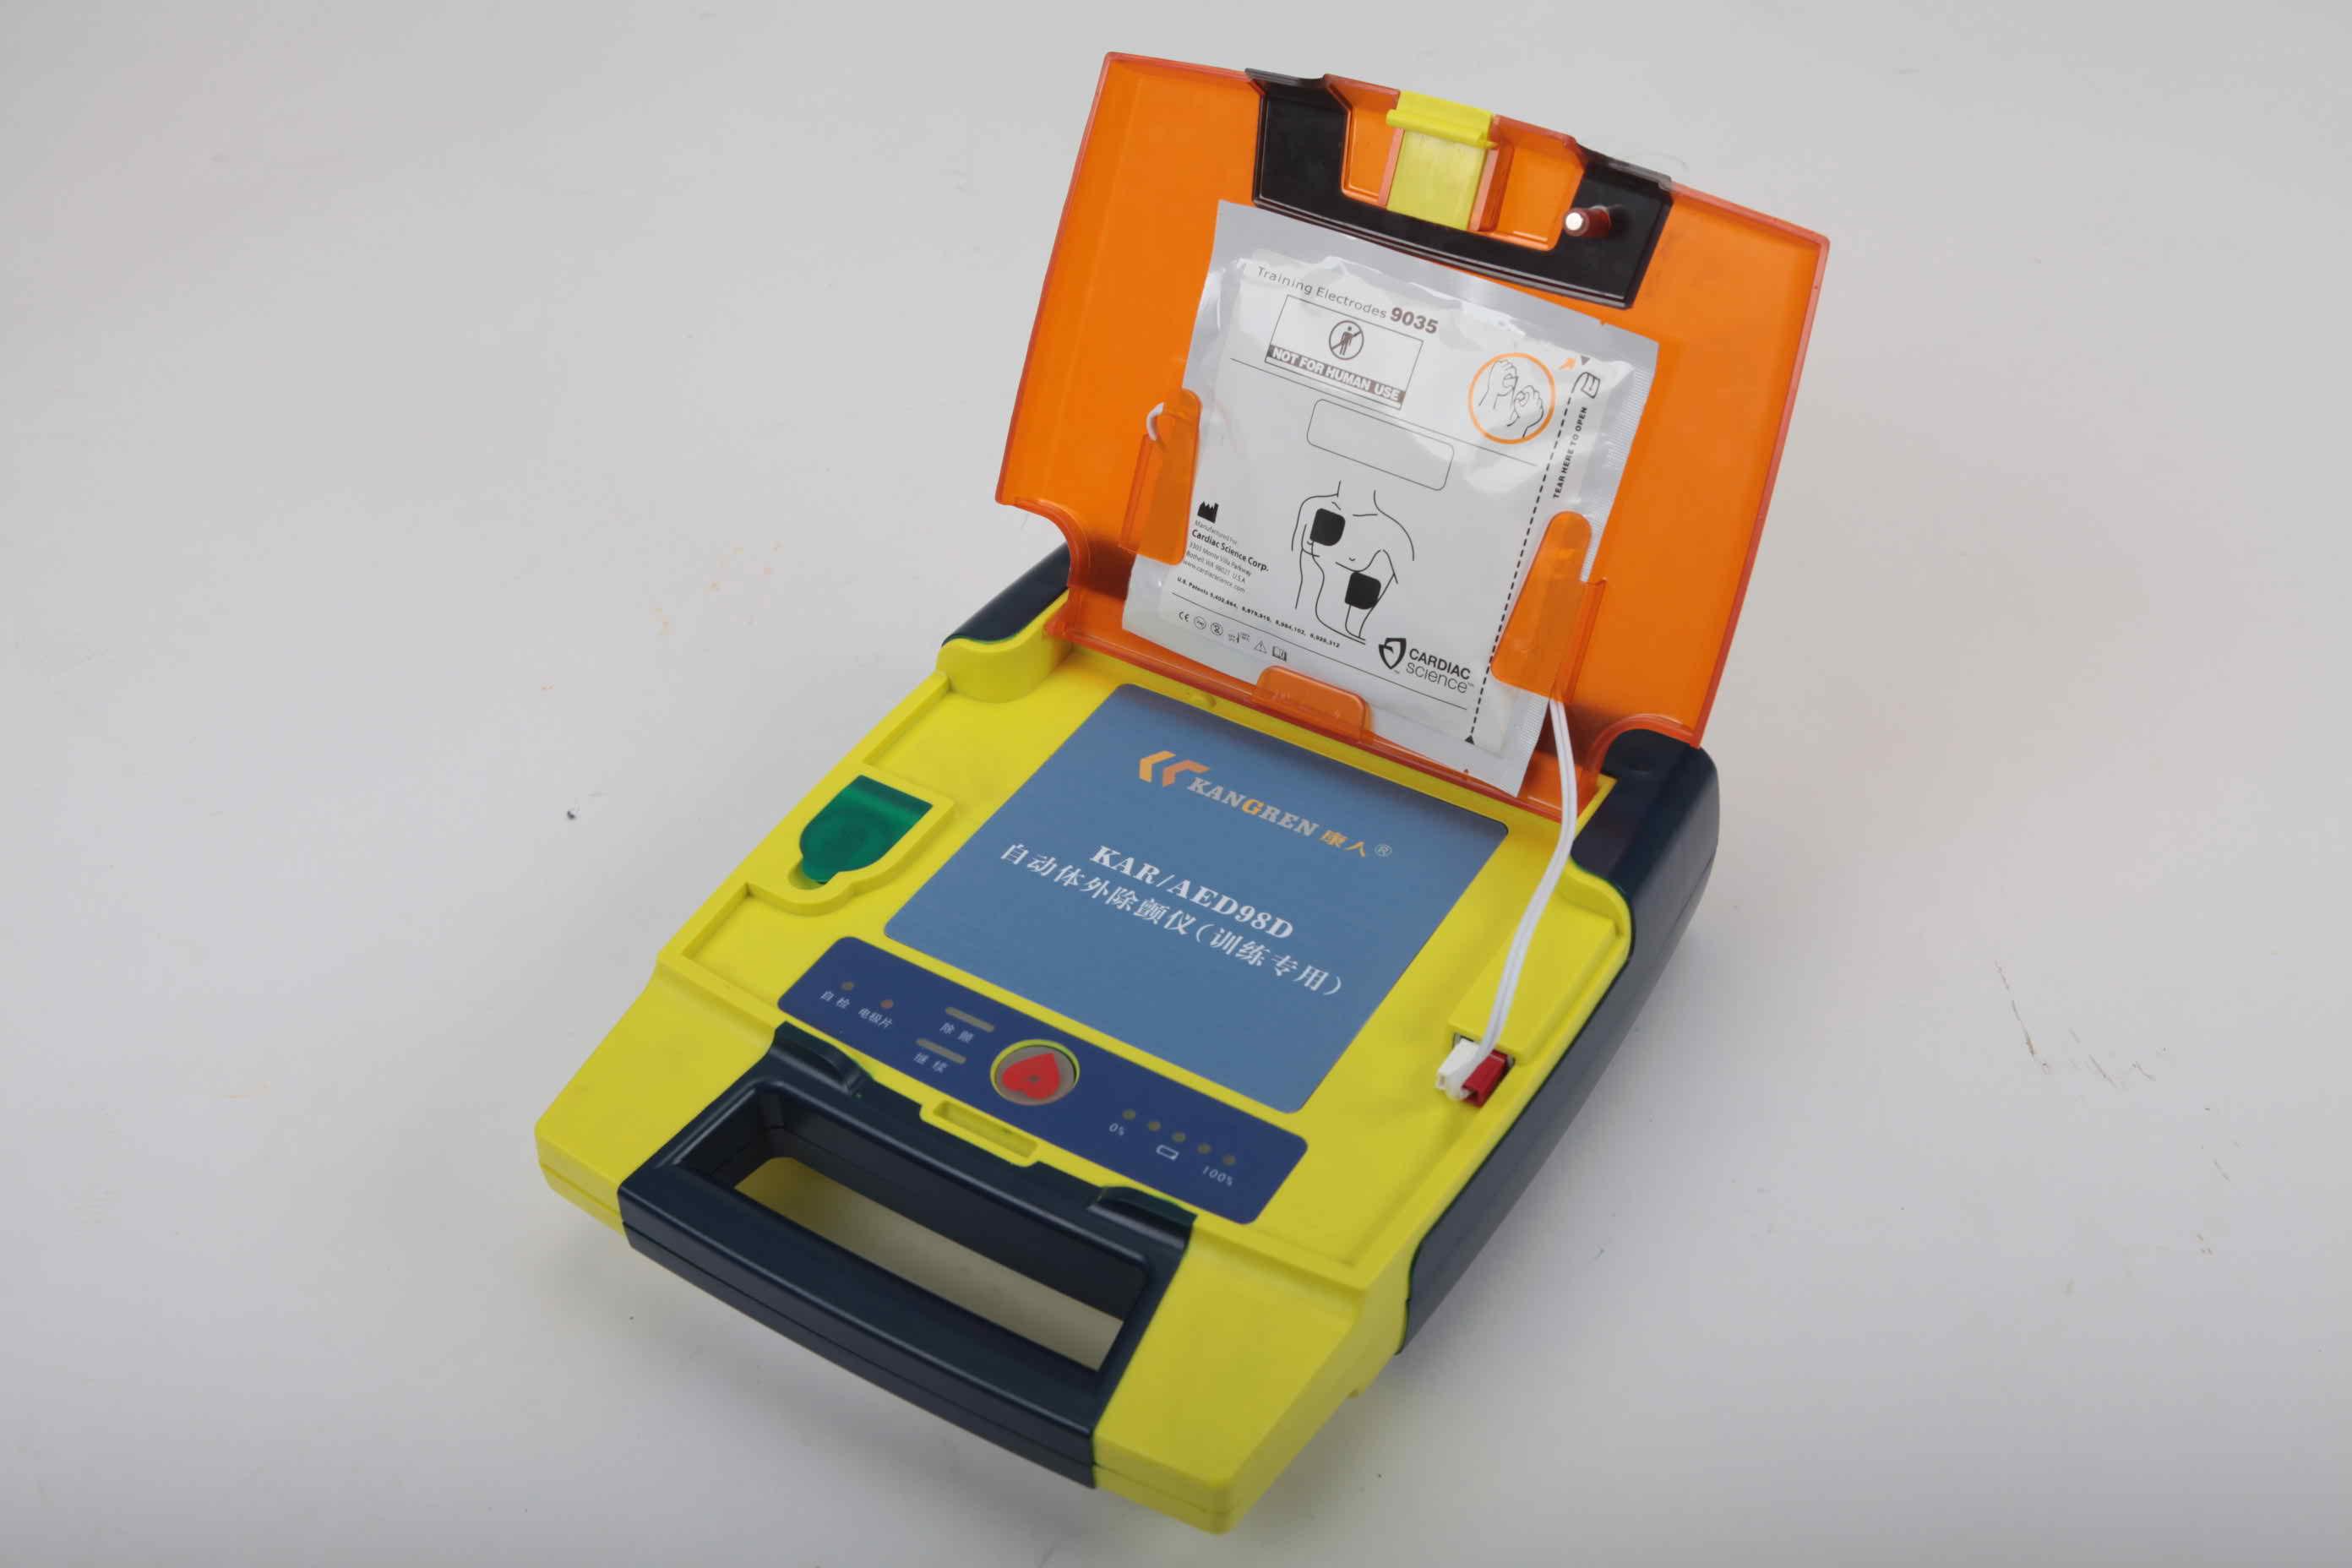 KAR/AED98D Automated External Defibrillator